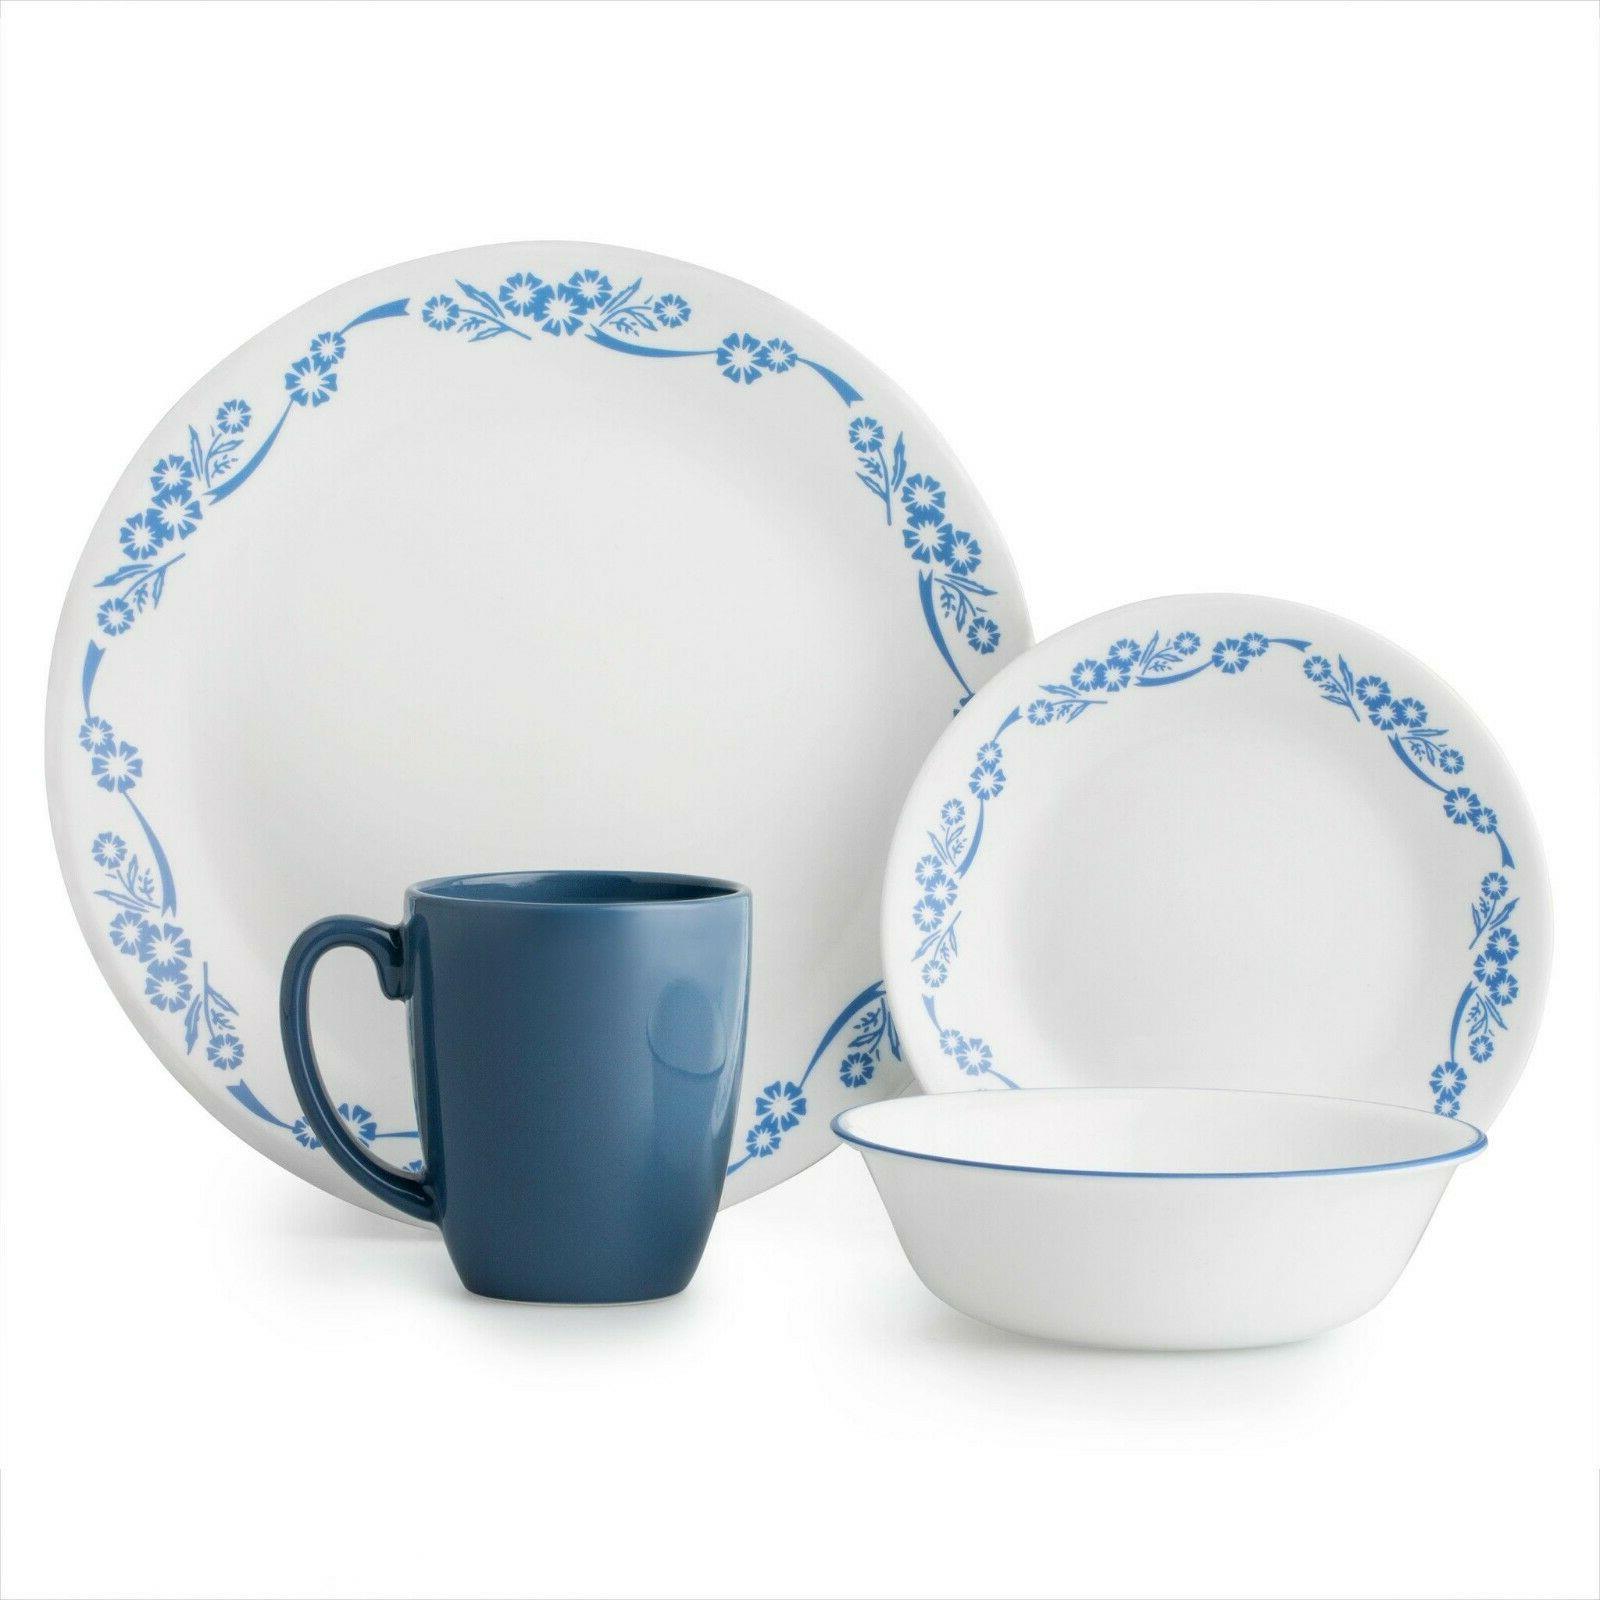 Corelle White Plate Set 16-Piece Dinnerware Set 4